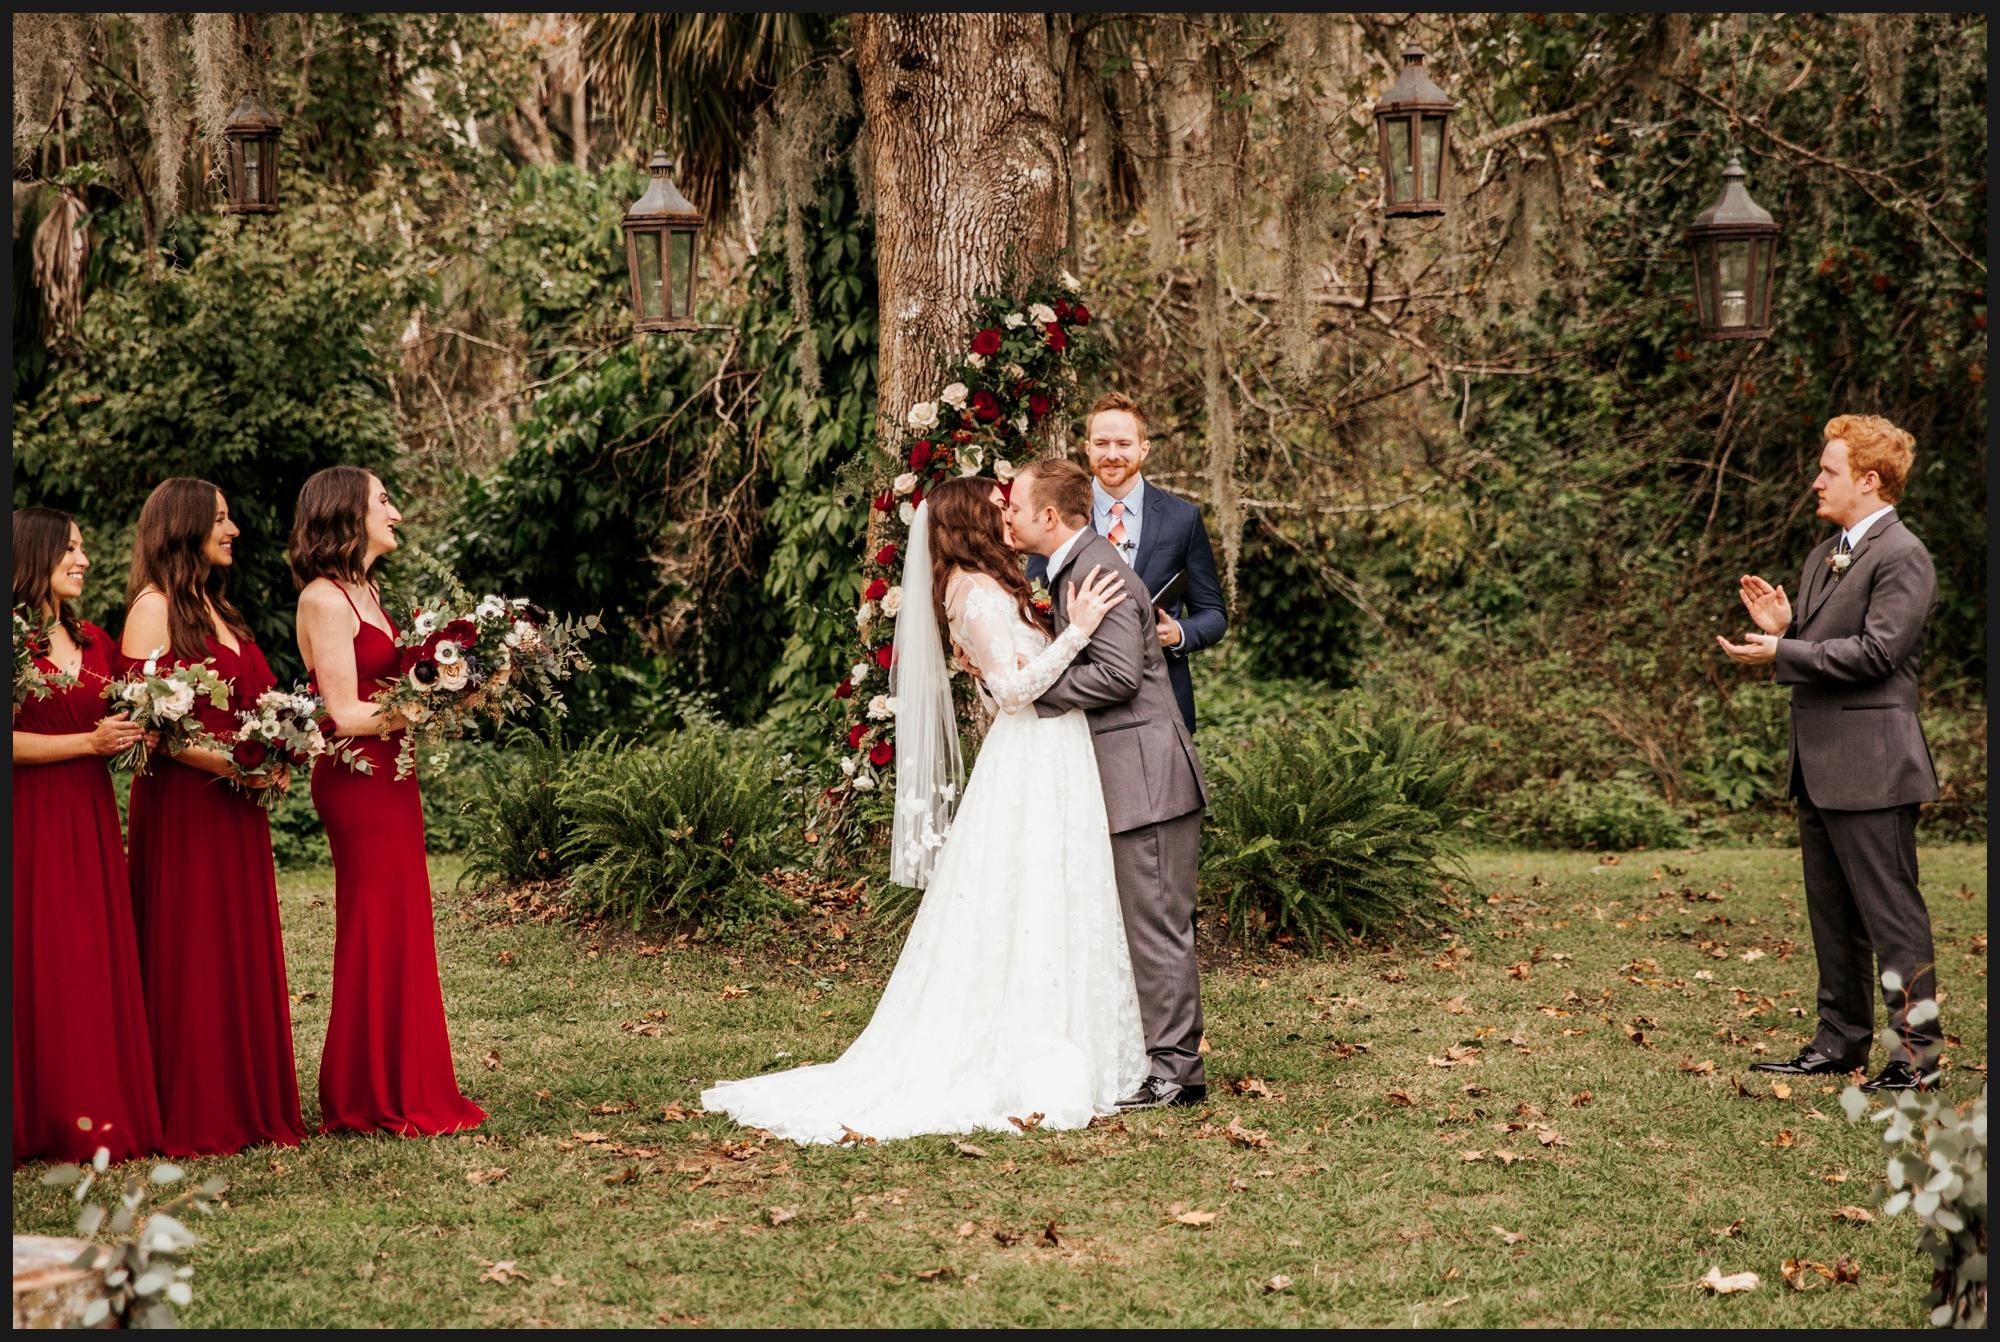 Orlando-Wedding-Photographer-destination-wedding-photographer-florida-wedding-photographer-hawaii-wedding-photographer_0527.jpg